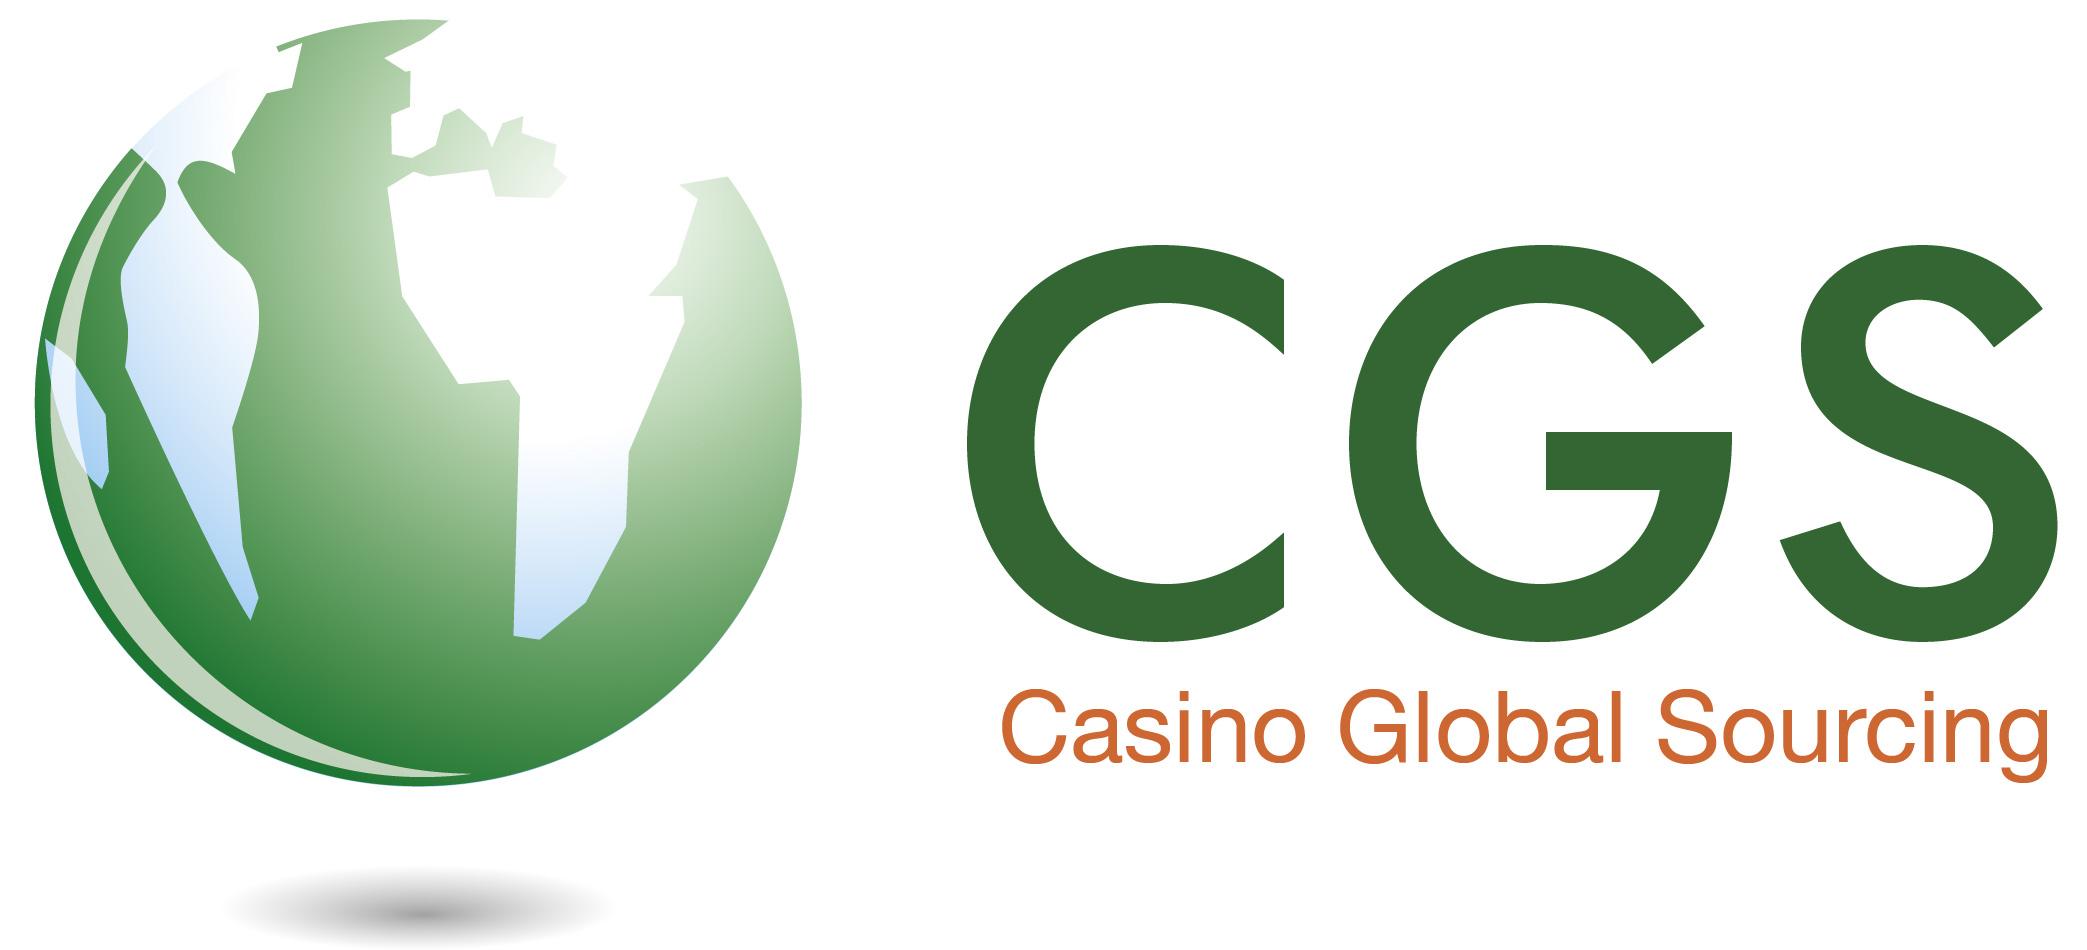 Casino sourcing india little creek casino rochester